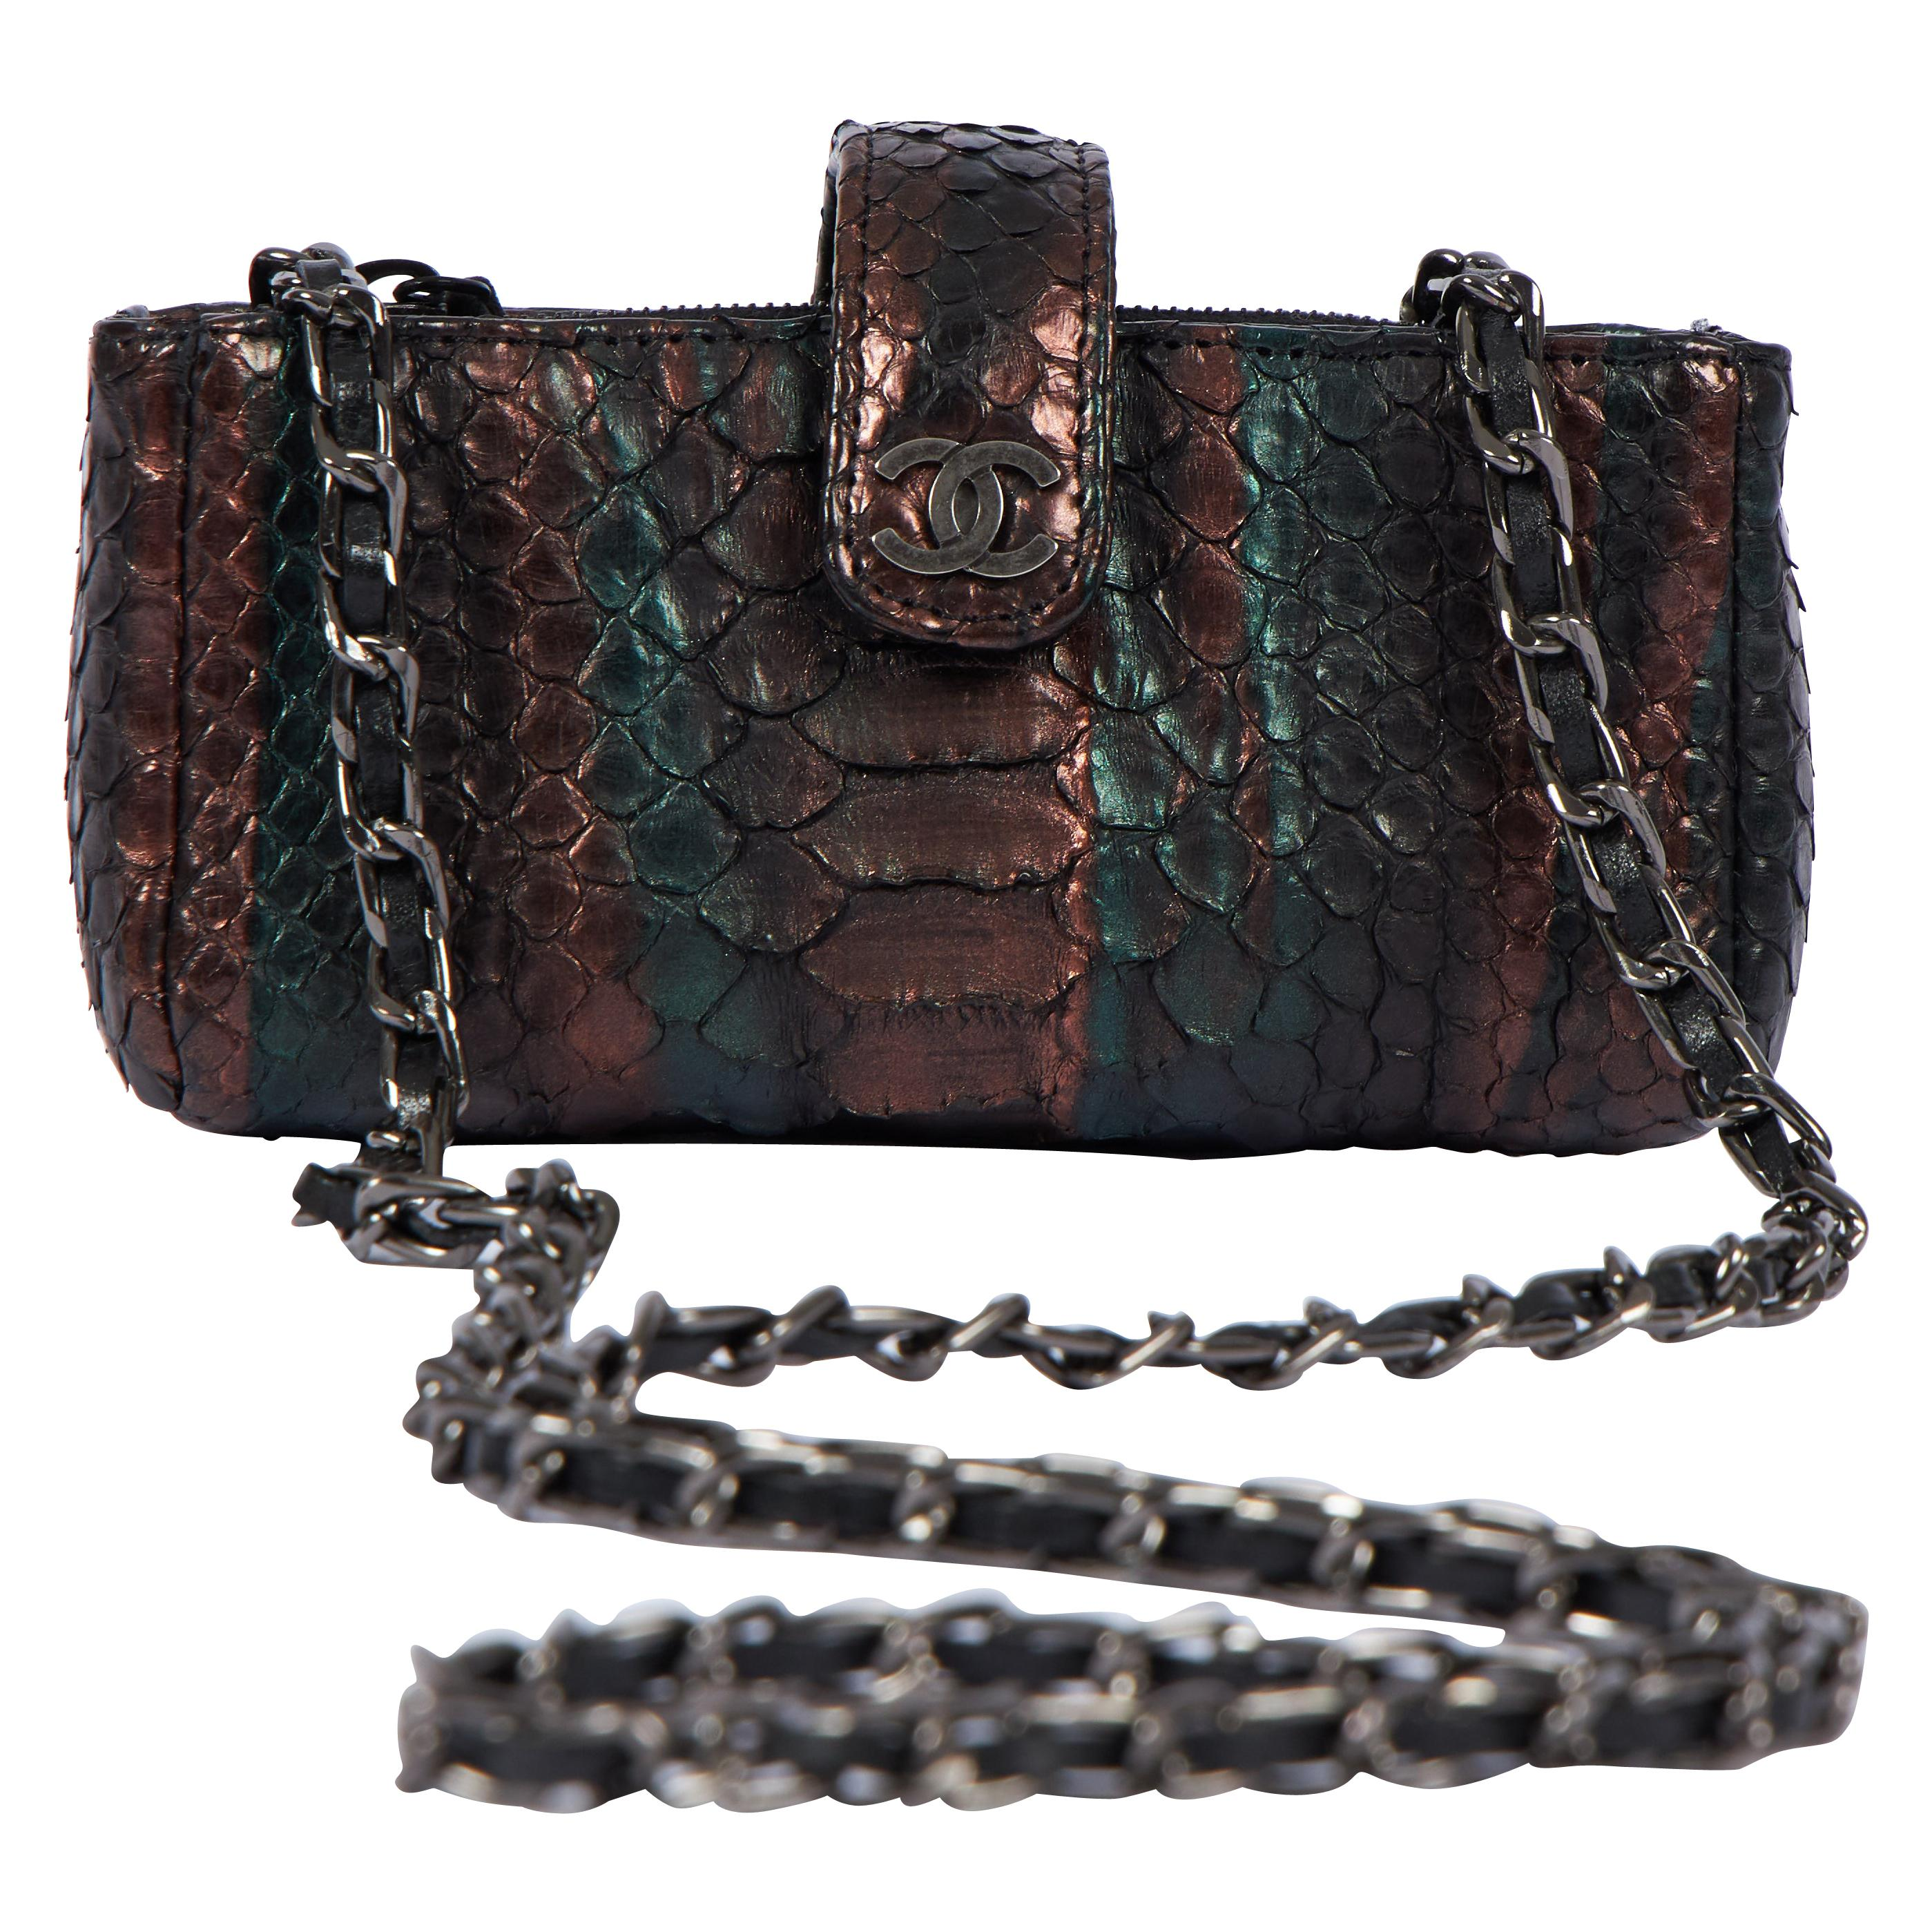 Chanel Iridescent Python Snake Mini Crossbody Bag